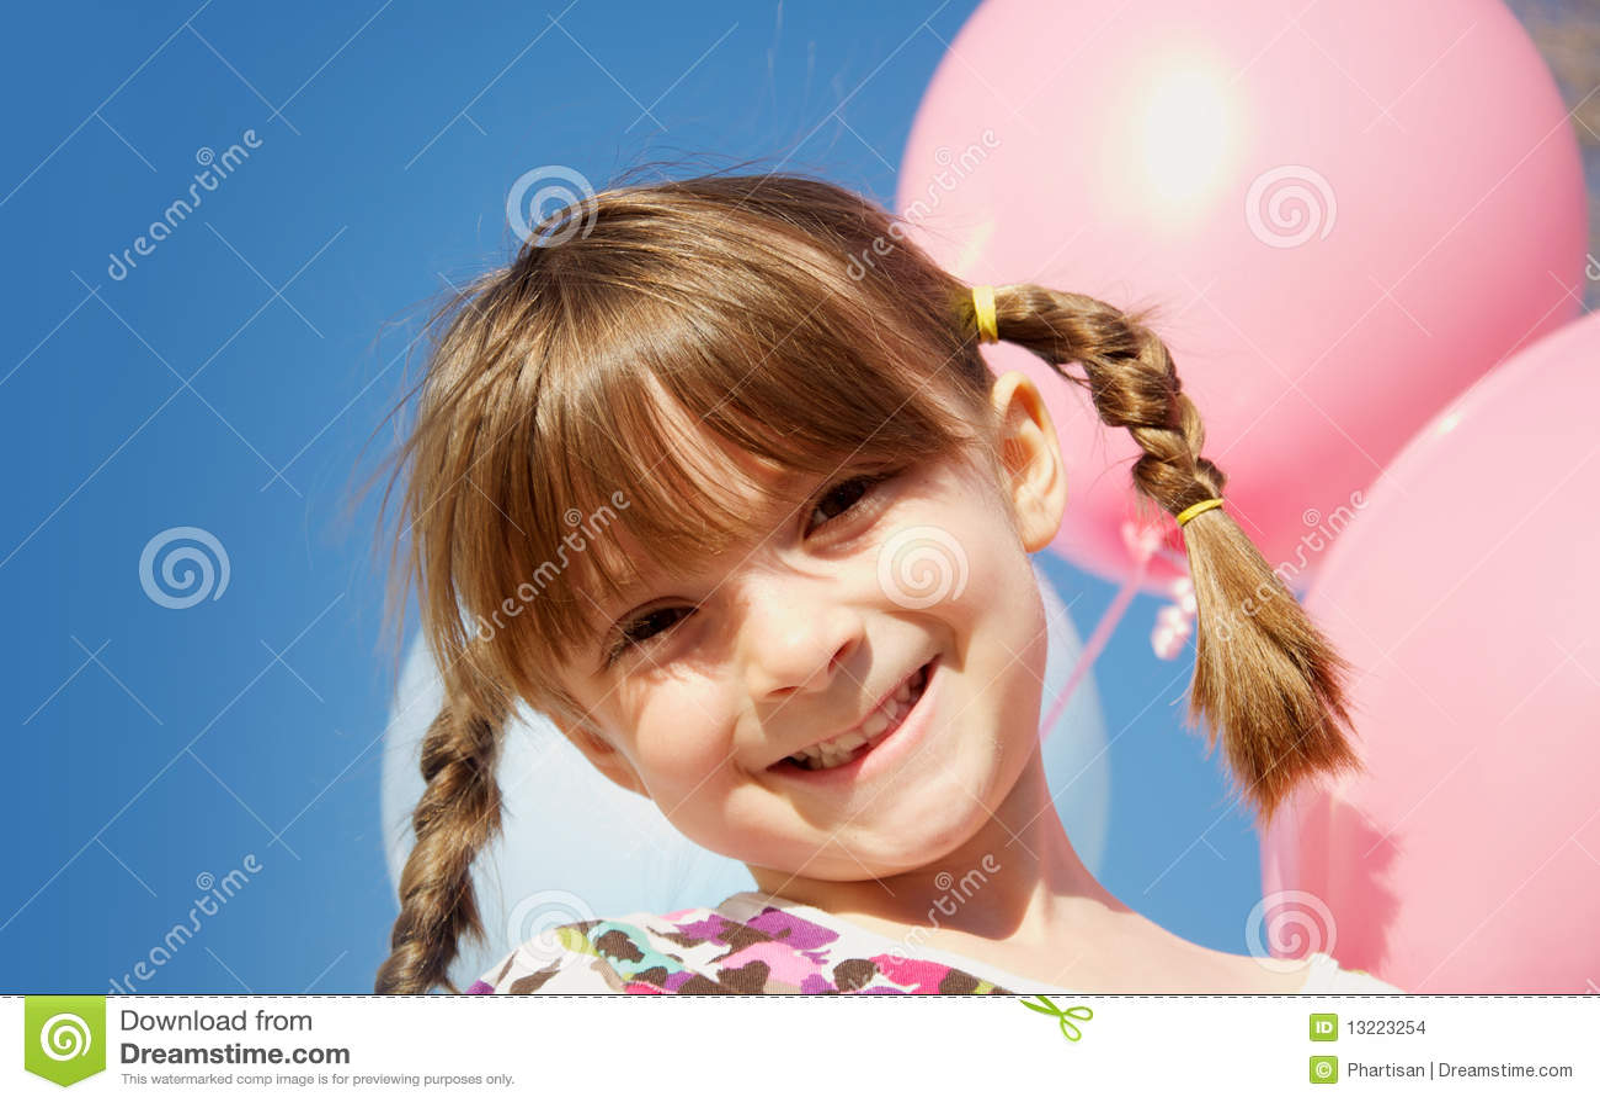 Pretty happy little girl holding balloons